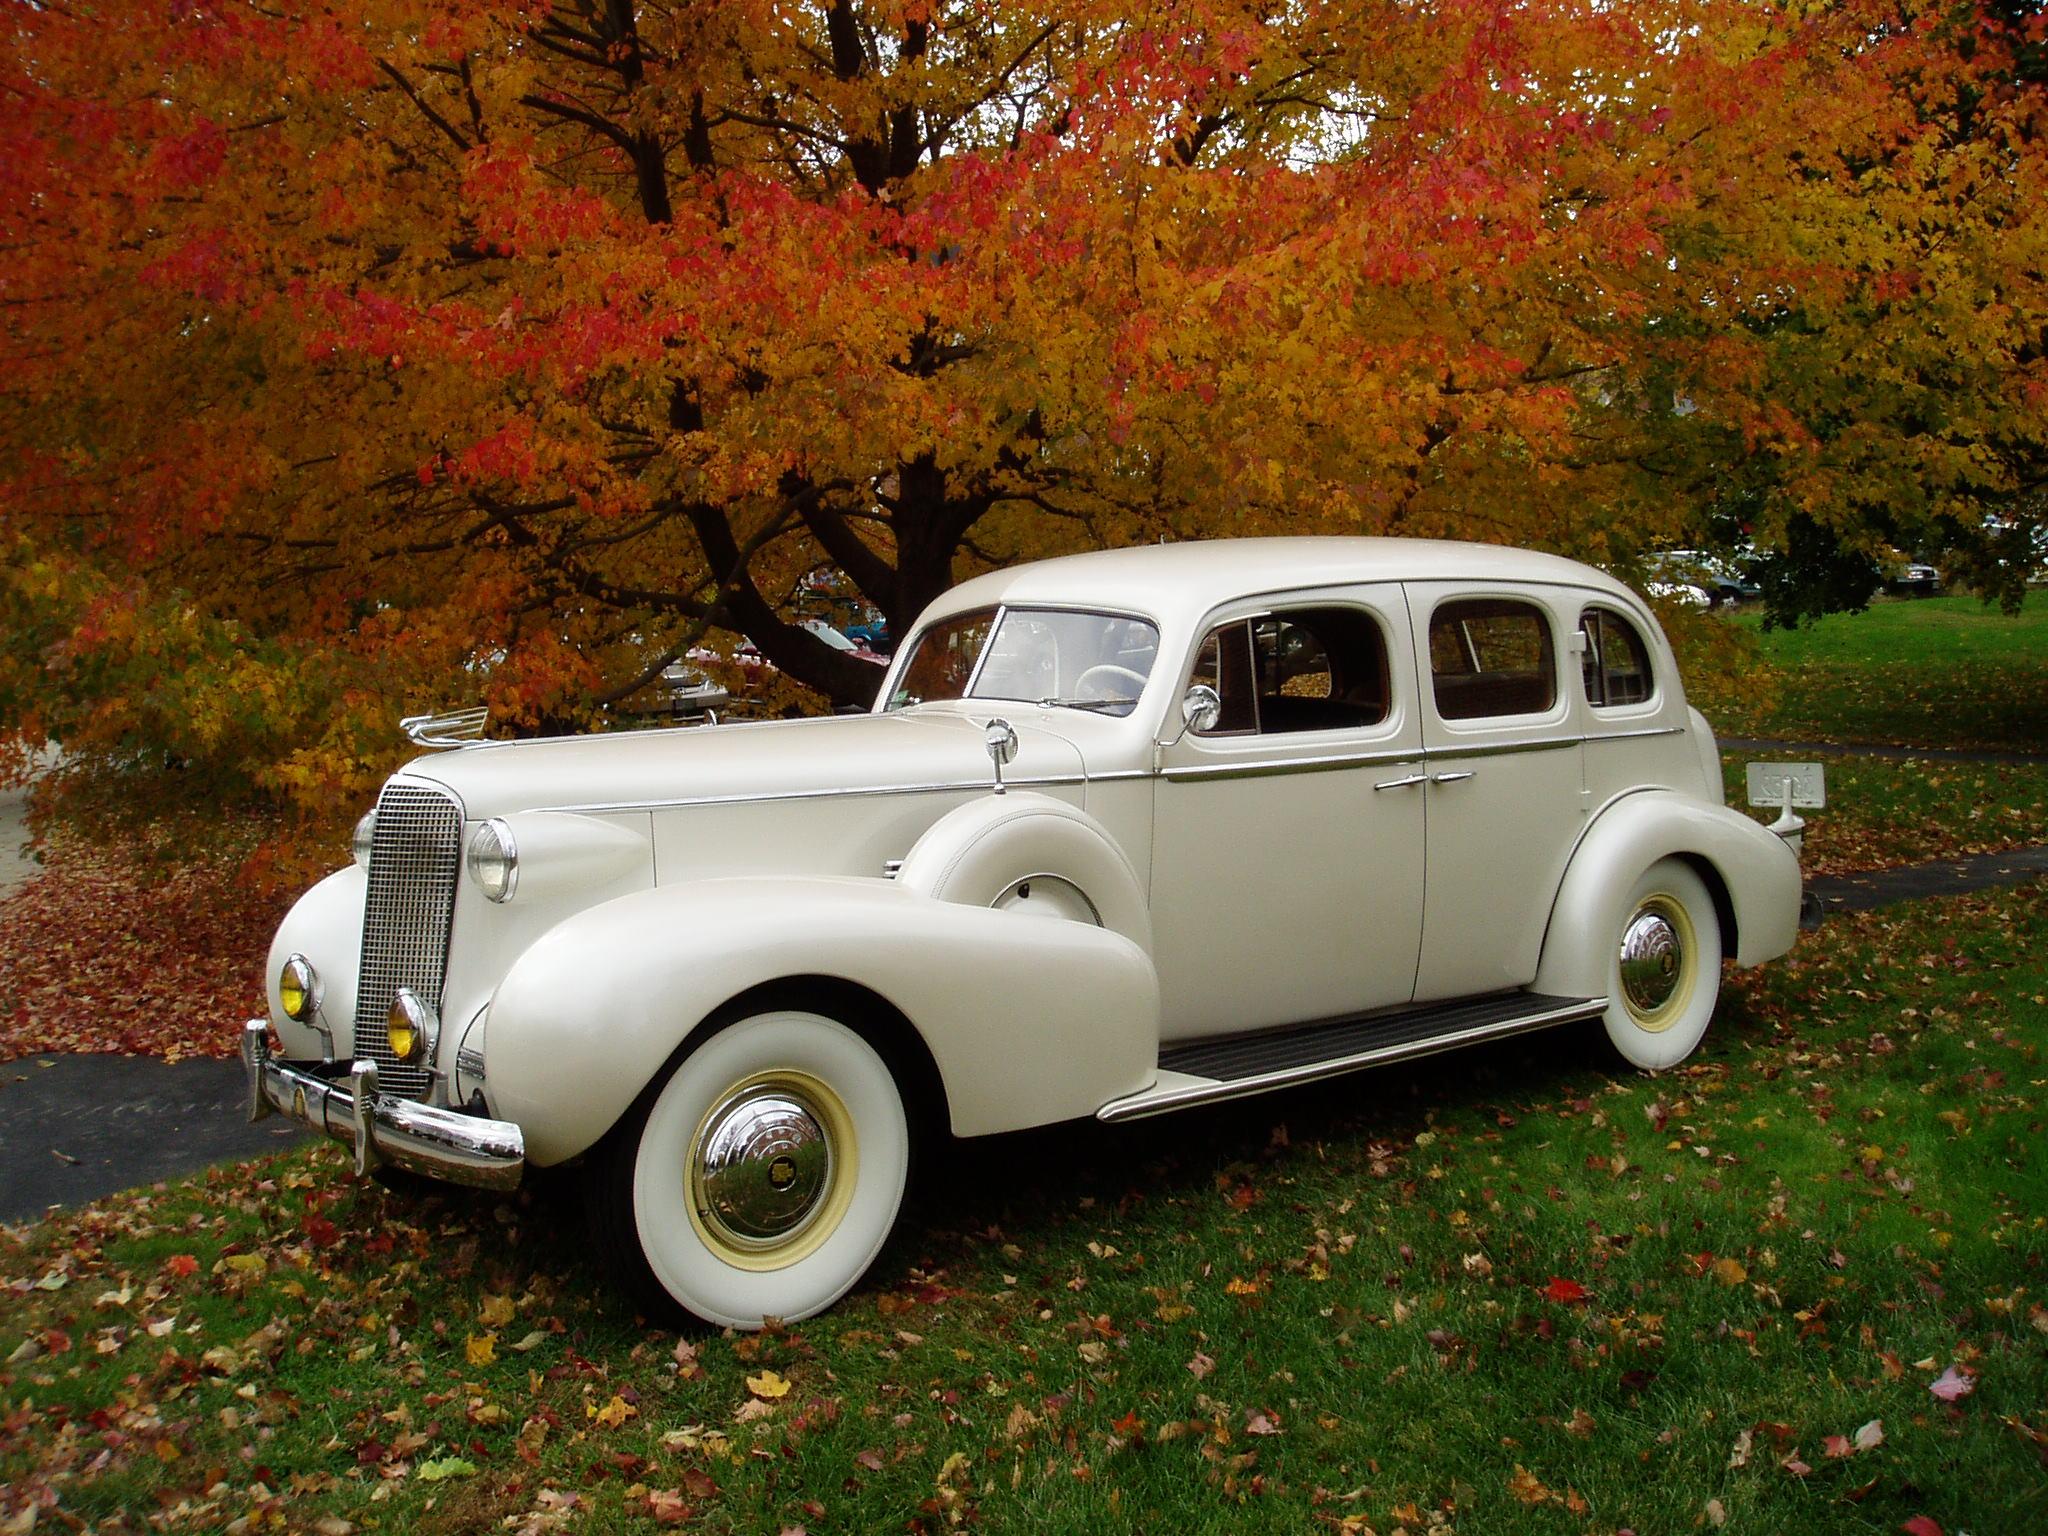 Antique Wedding Transportation: 1937 Cadillac